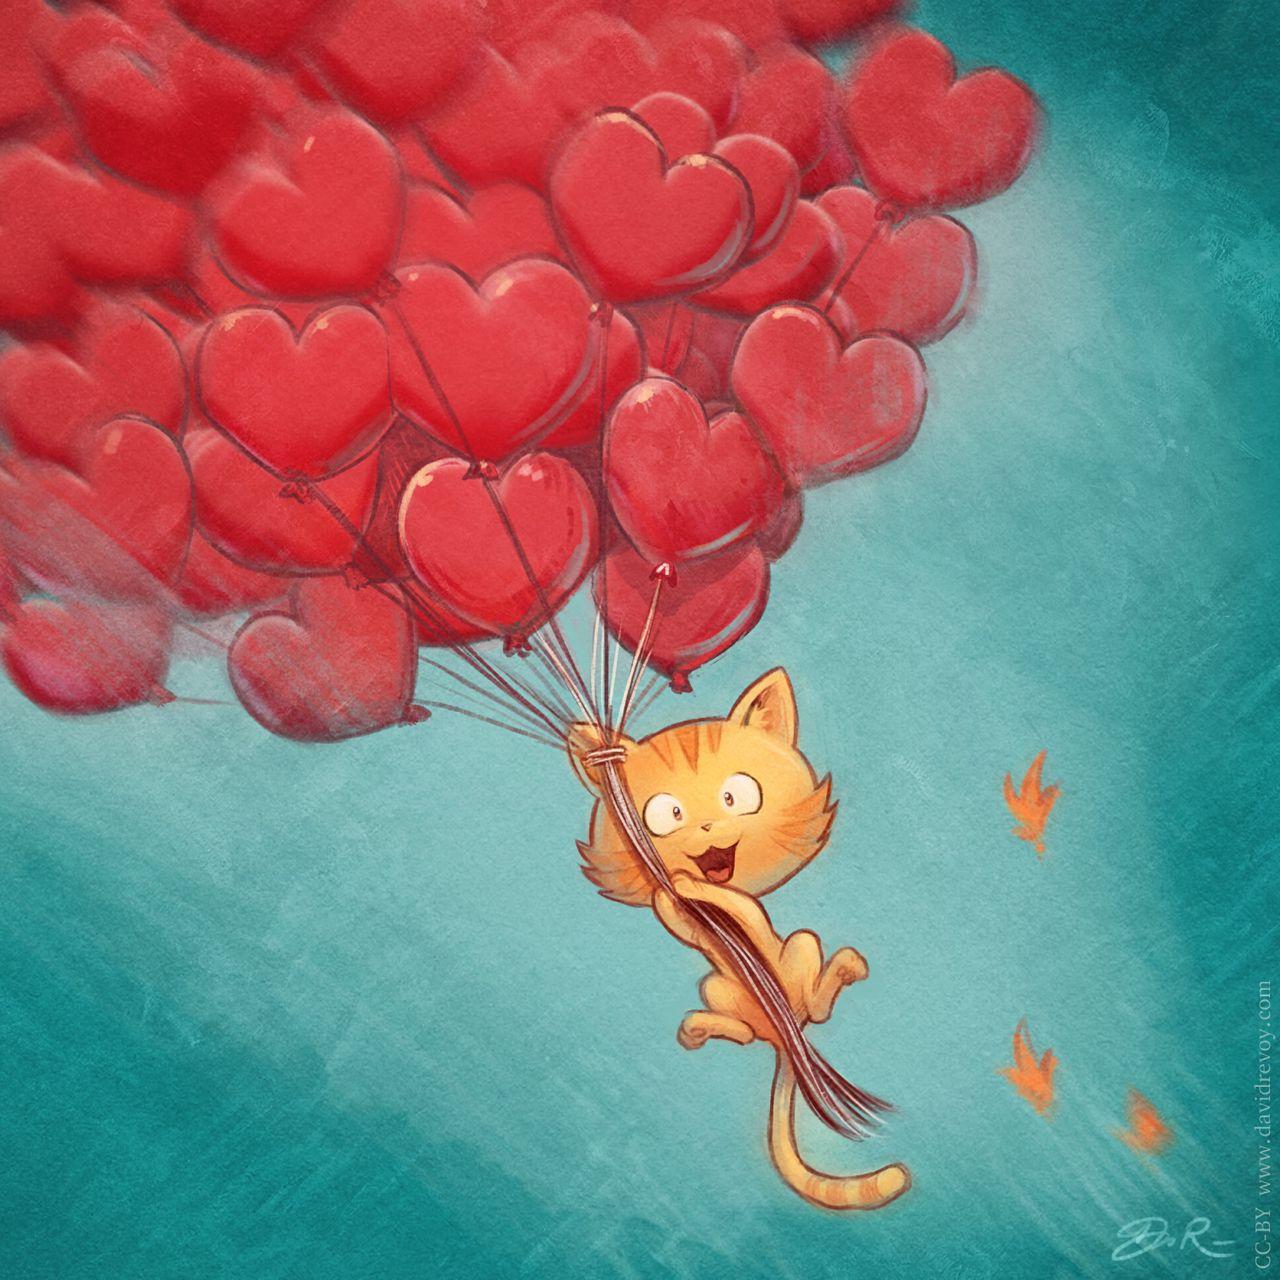 1280x1280 Wallpaper cat, balloons, hearts, flight, sky, art